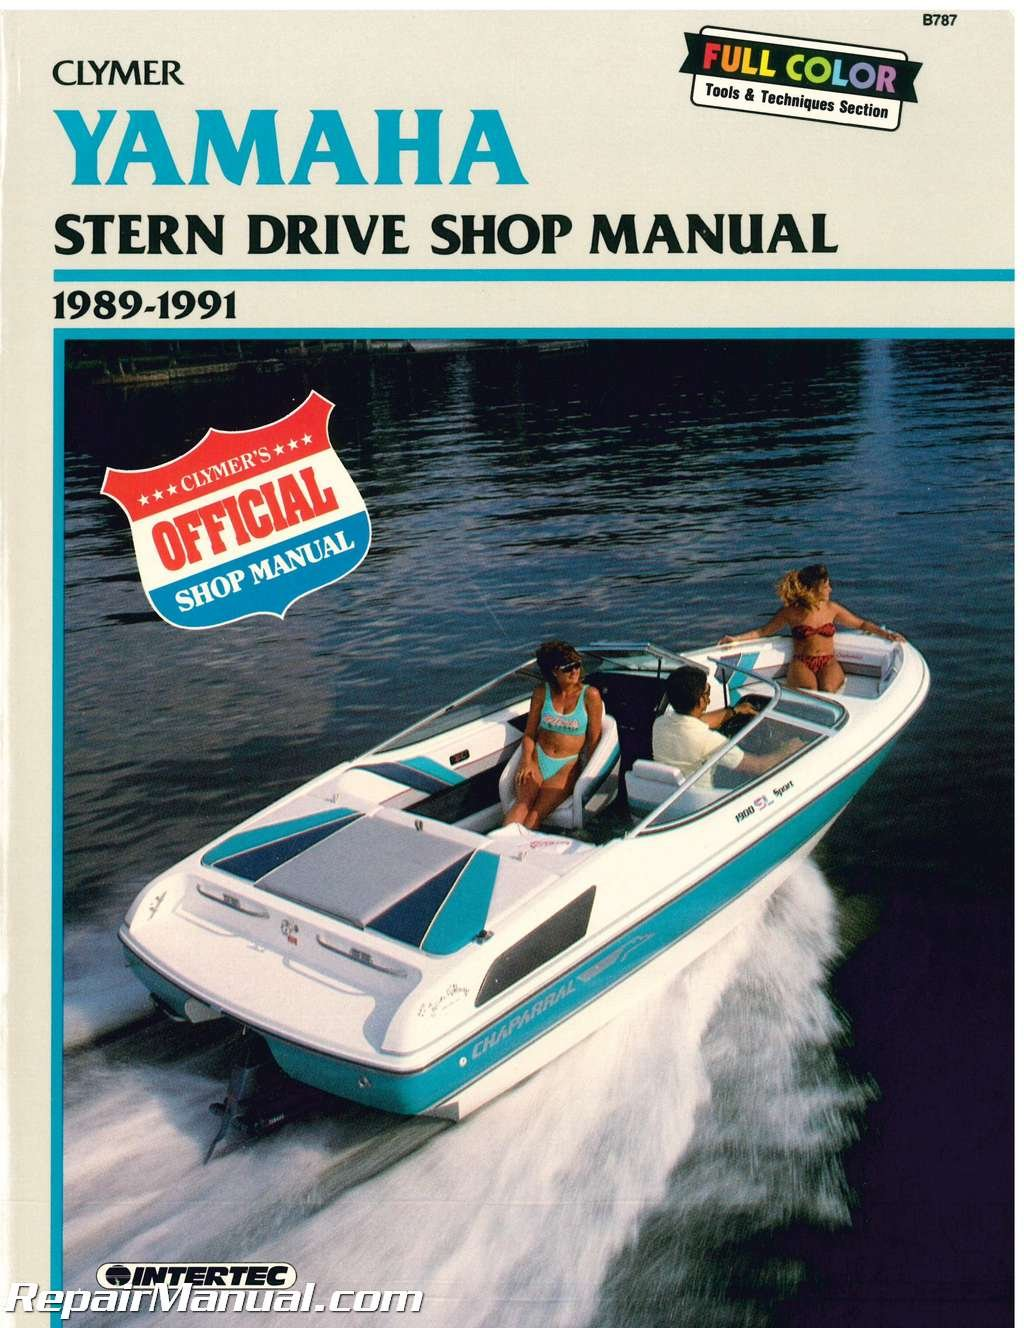 B787 Yamaha Stern Drive 1989 1990 1991 Clymer Boat Engine Repair Waverunner Wiring Diagram Manual Manufacturer Books